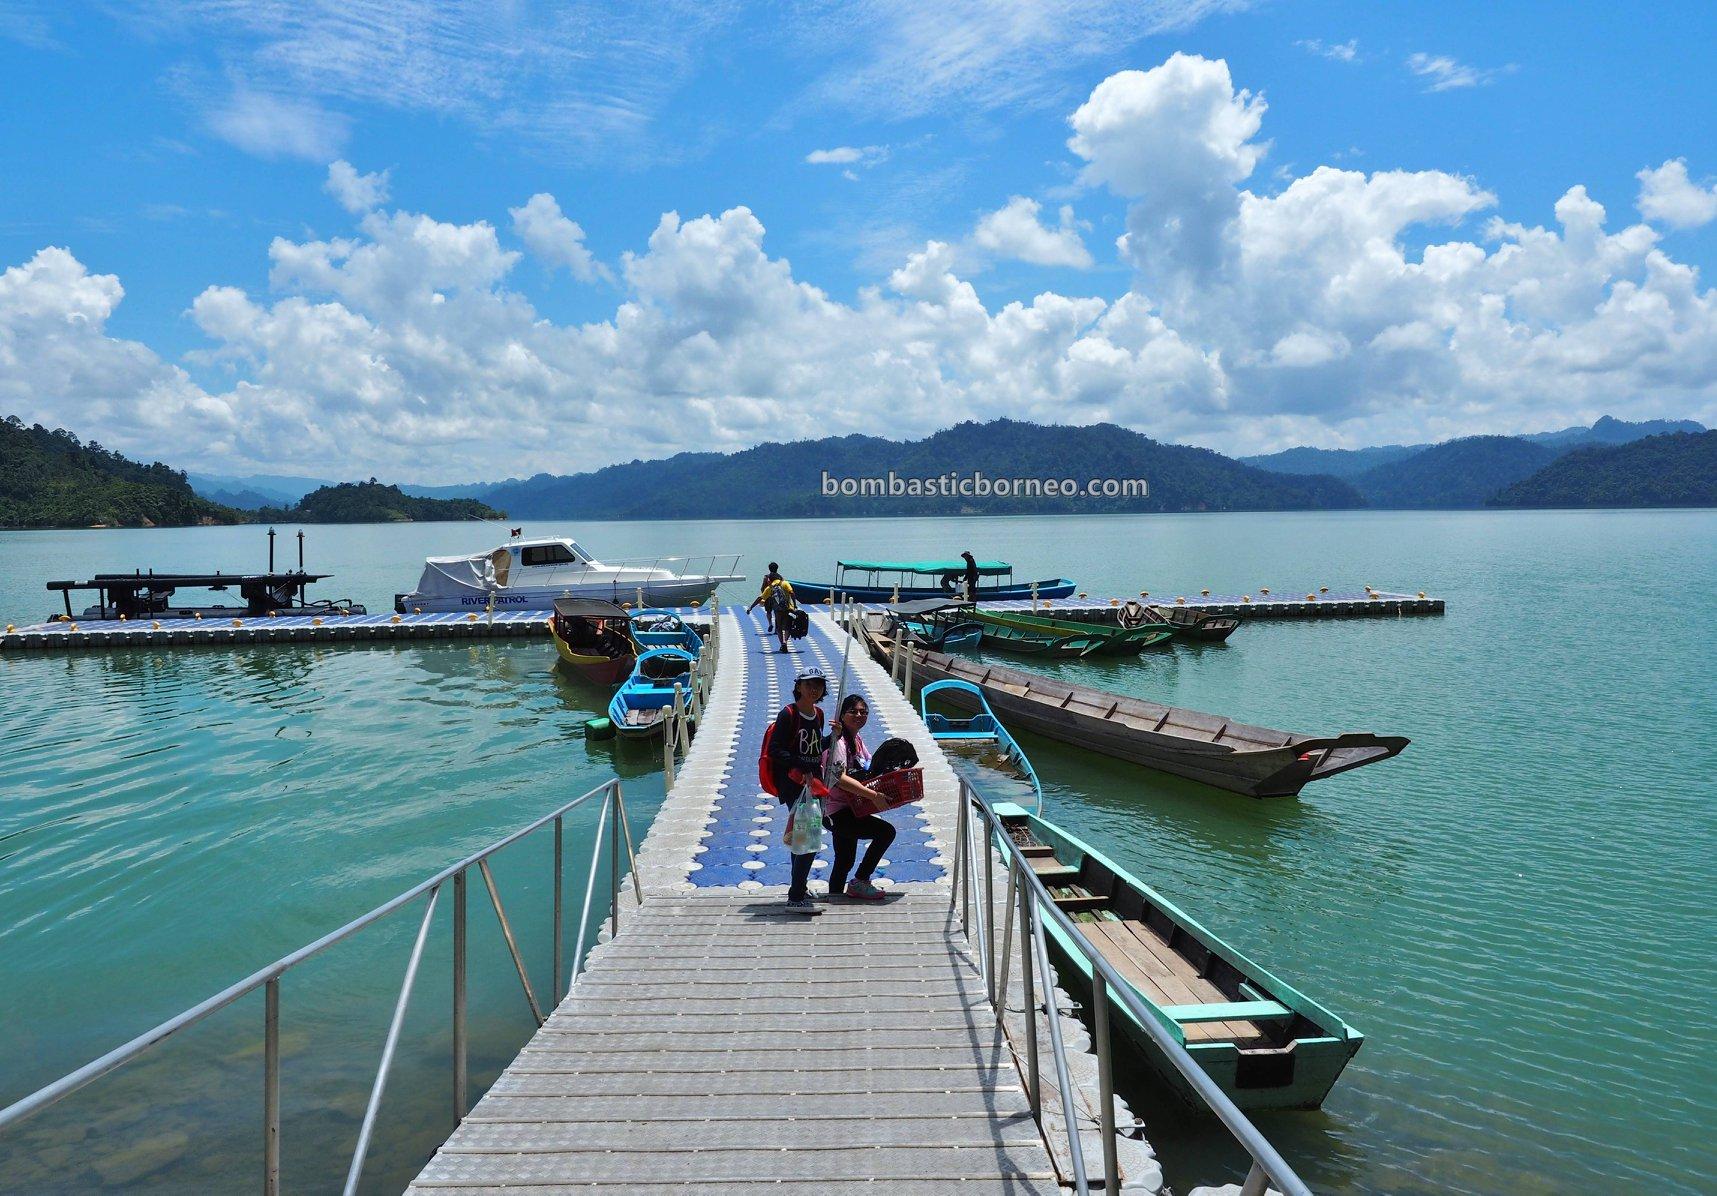 Hydroelectric Power, empangan, backpackers, destination, fishing trip, memancing ikan, wharf, Belaga, Kapit, Tourism, travel guide, Cross Border, Borneo, 穿越婆罗洲游踪, 砂拉越巴贡水电站, 马来西亚旅游景点,